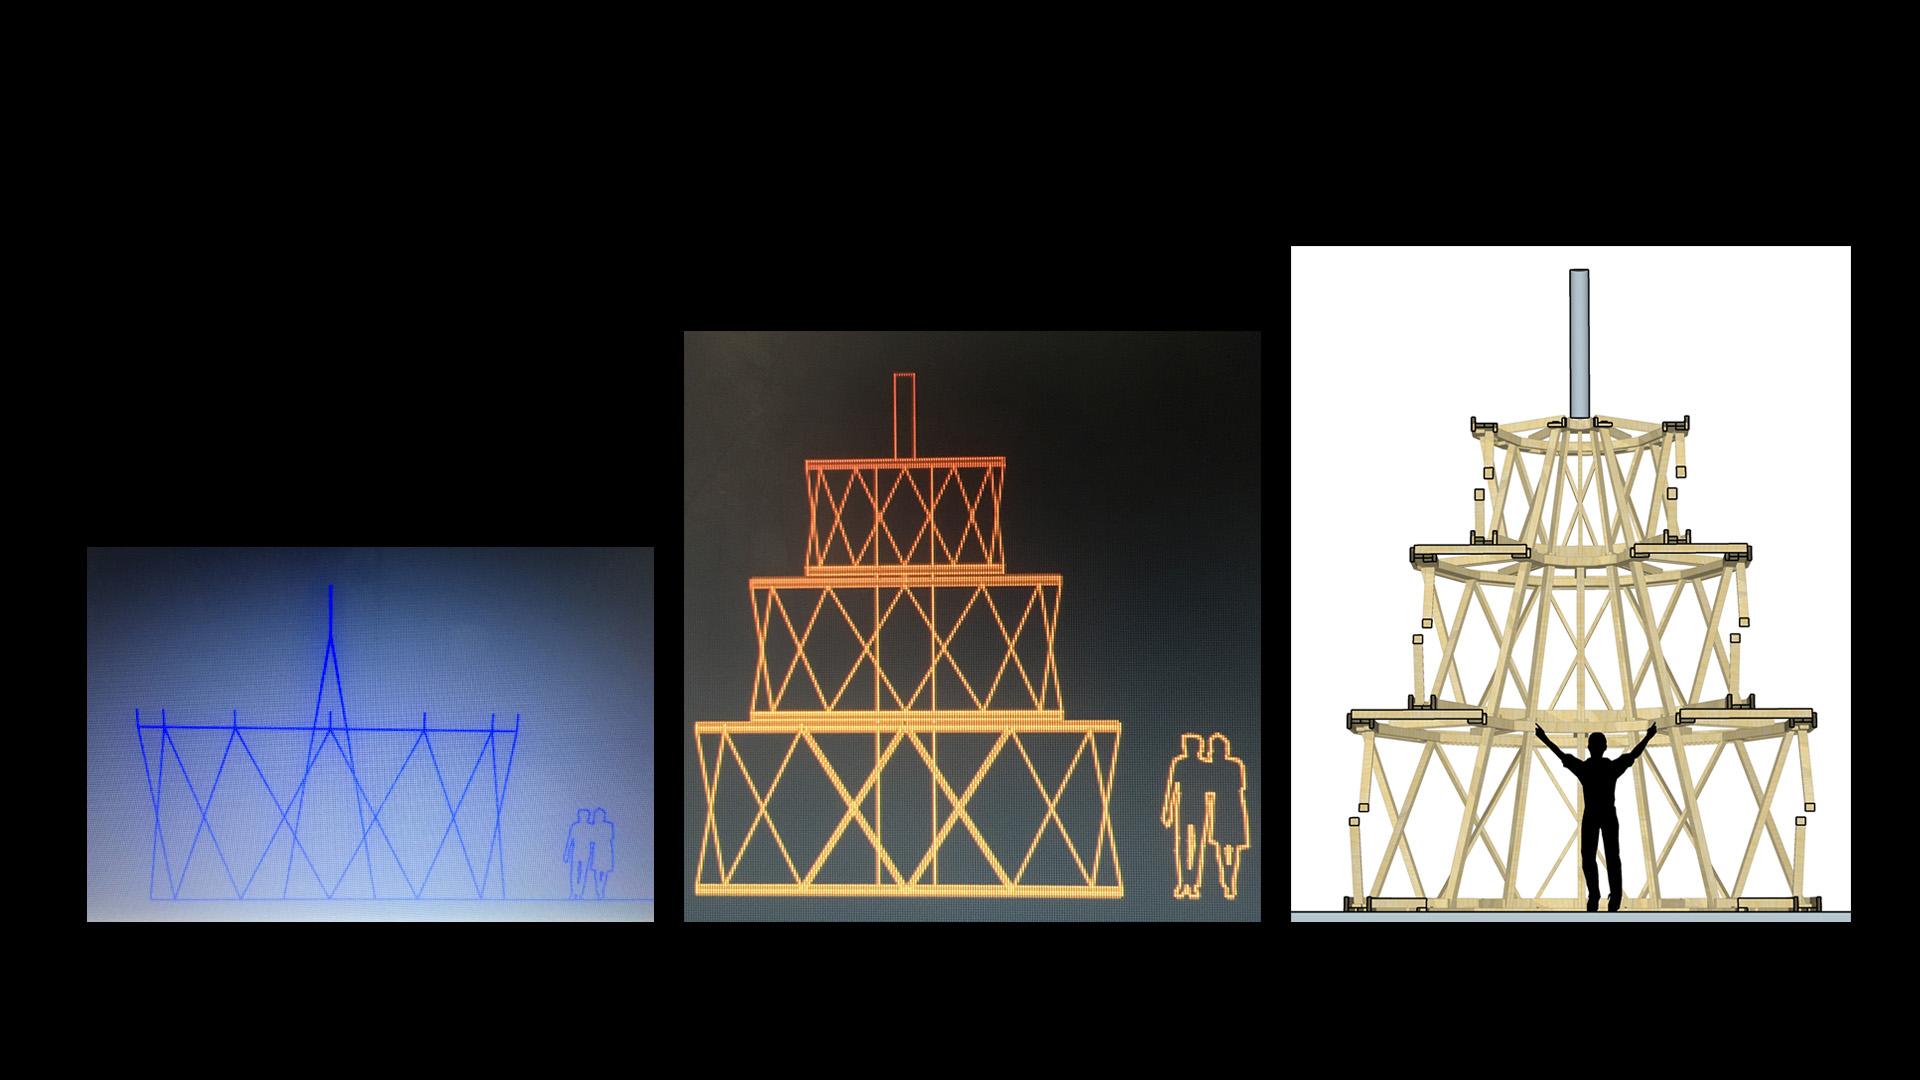 18_2_6-FINAL-tidewater-burners-slideshow_Page_08.jpg